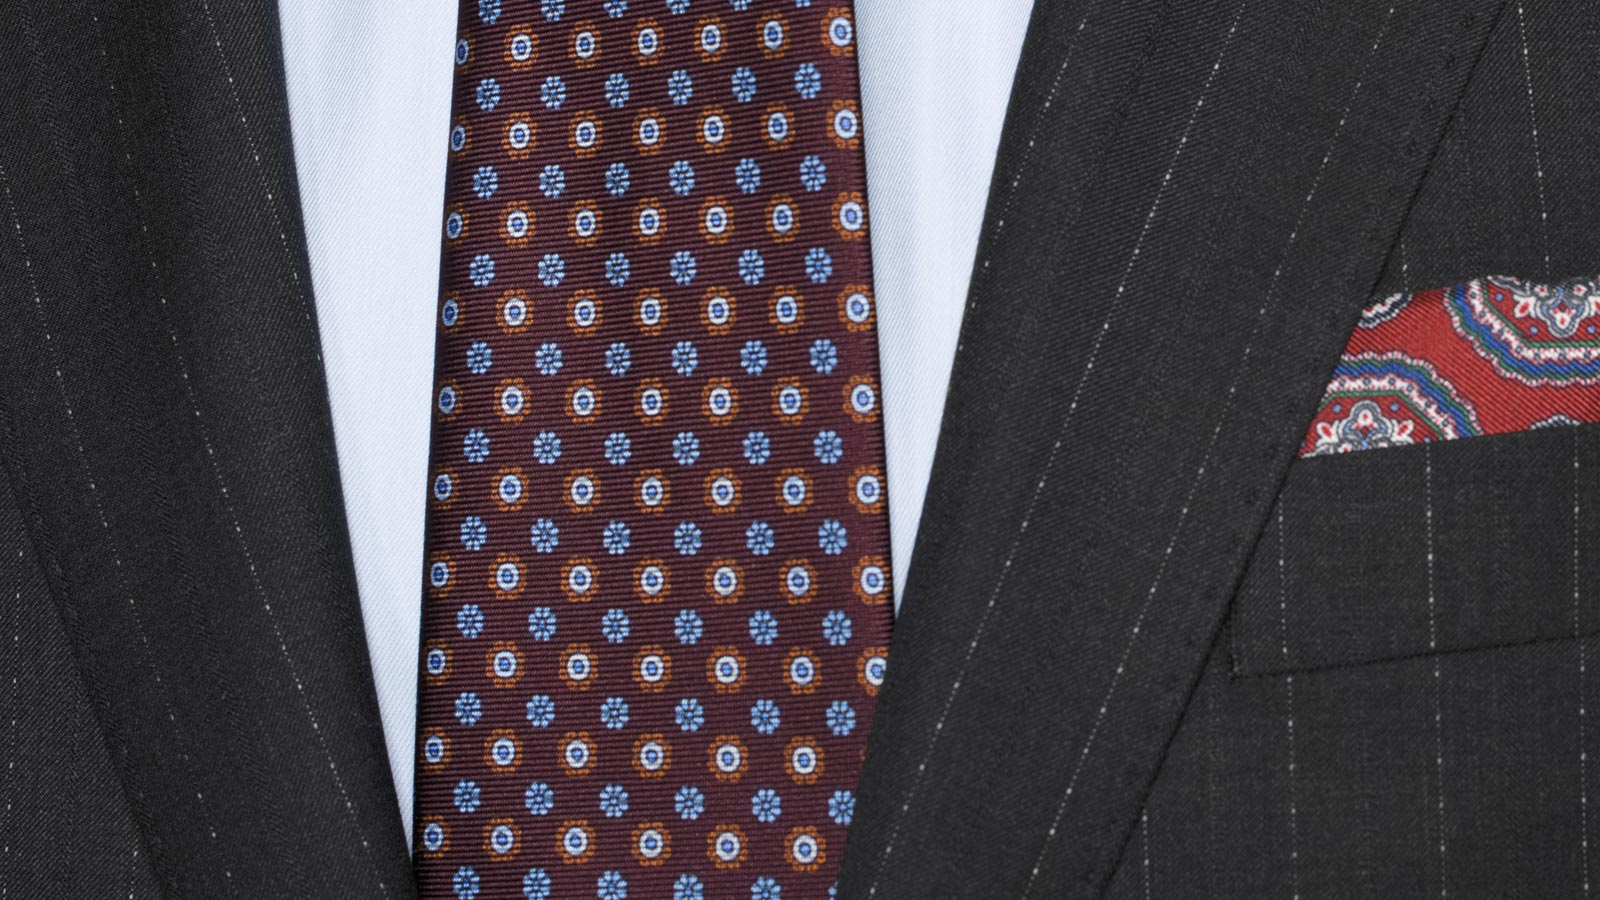 Sartoria Charcoal Pinstripe 160s Suit - slider image 1